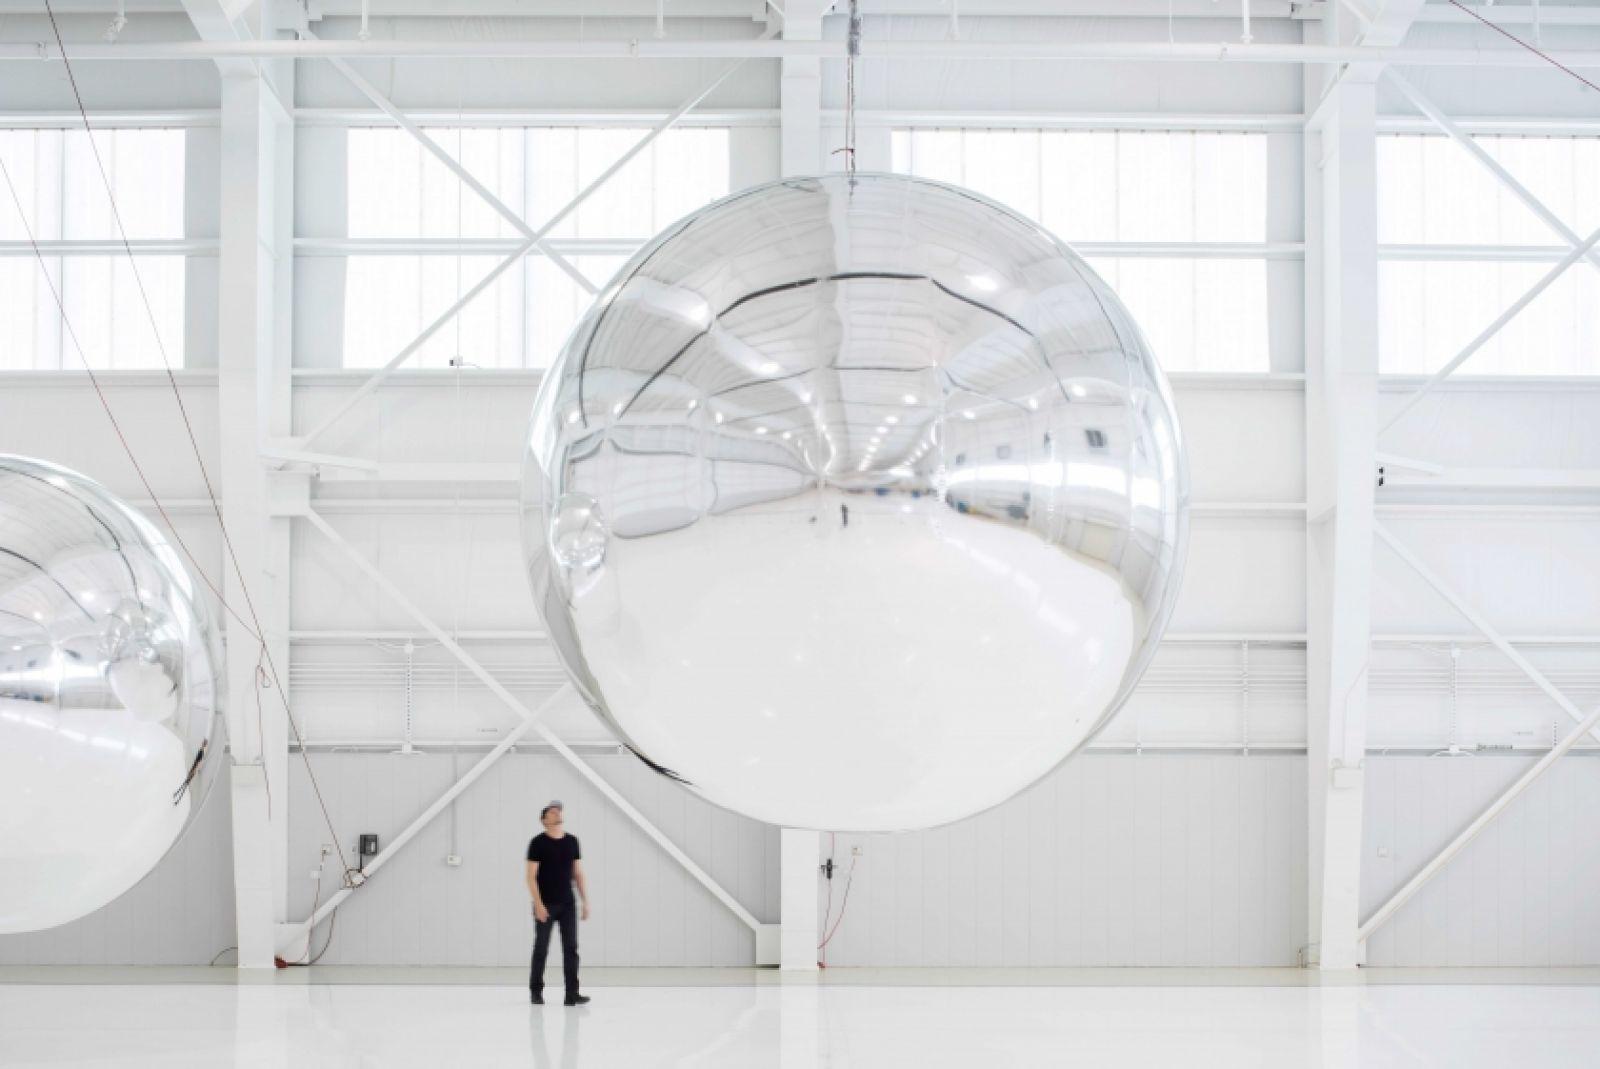 Paglen avec son Prototype for a Nonfunctional Satellite (Design 4; Build 4), 2013, image ©Altman Siegel Gallery et Metro Pictures